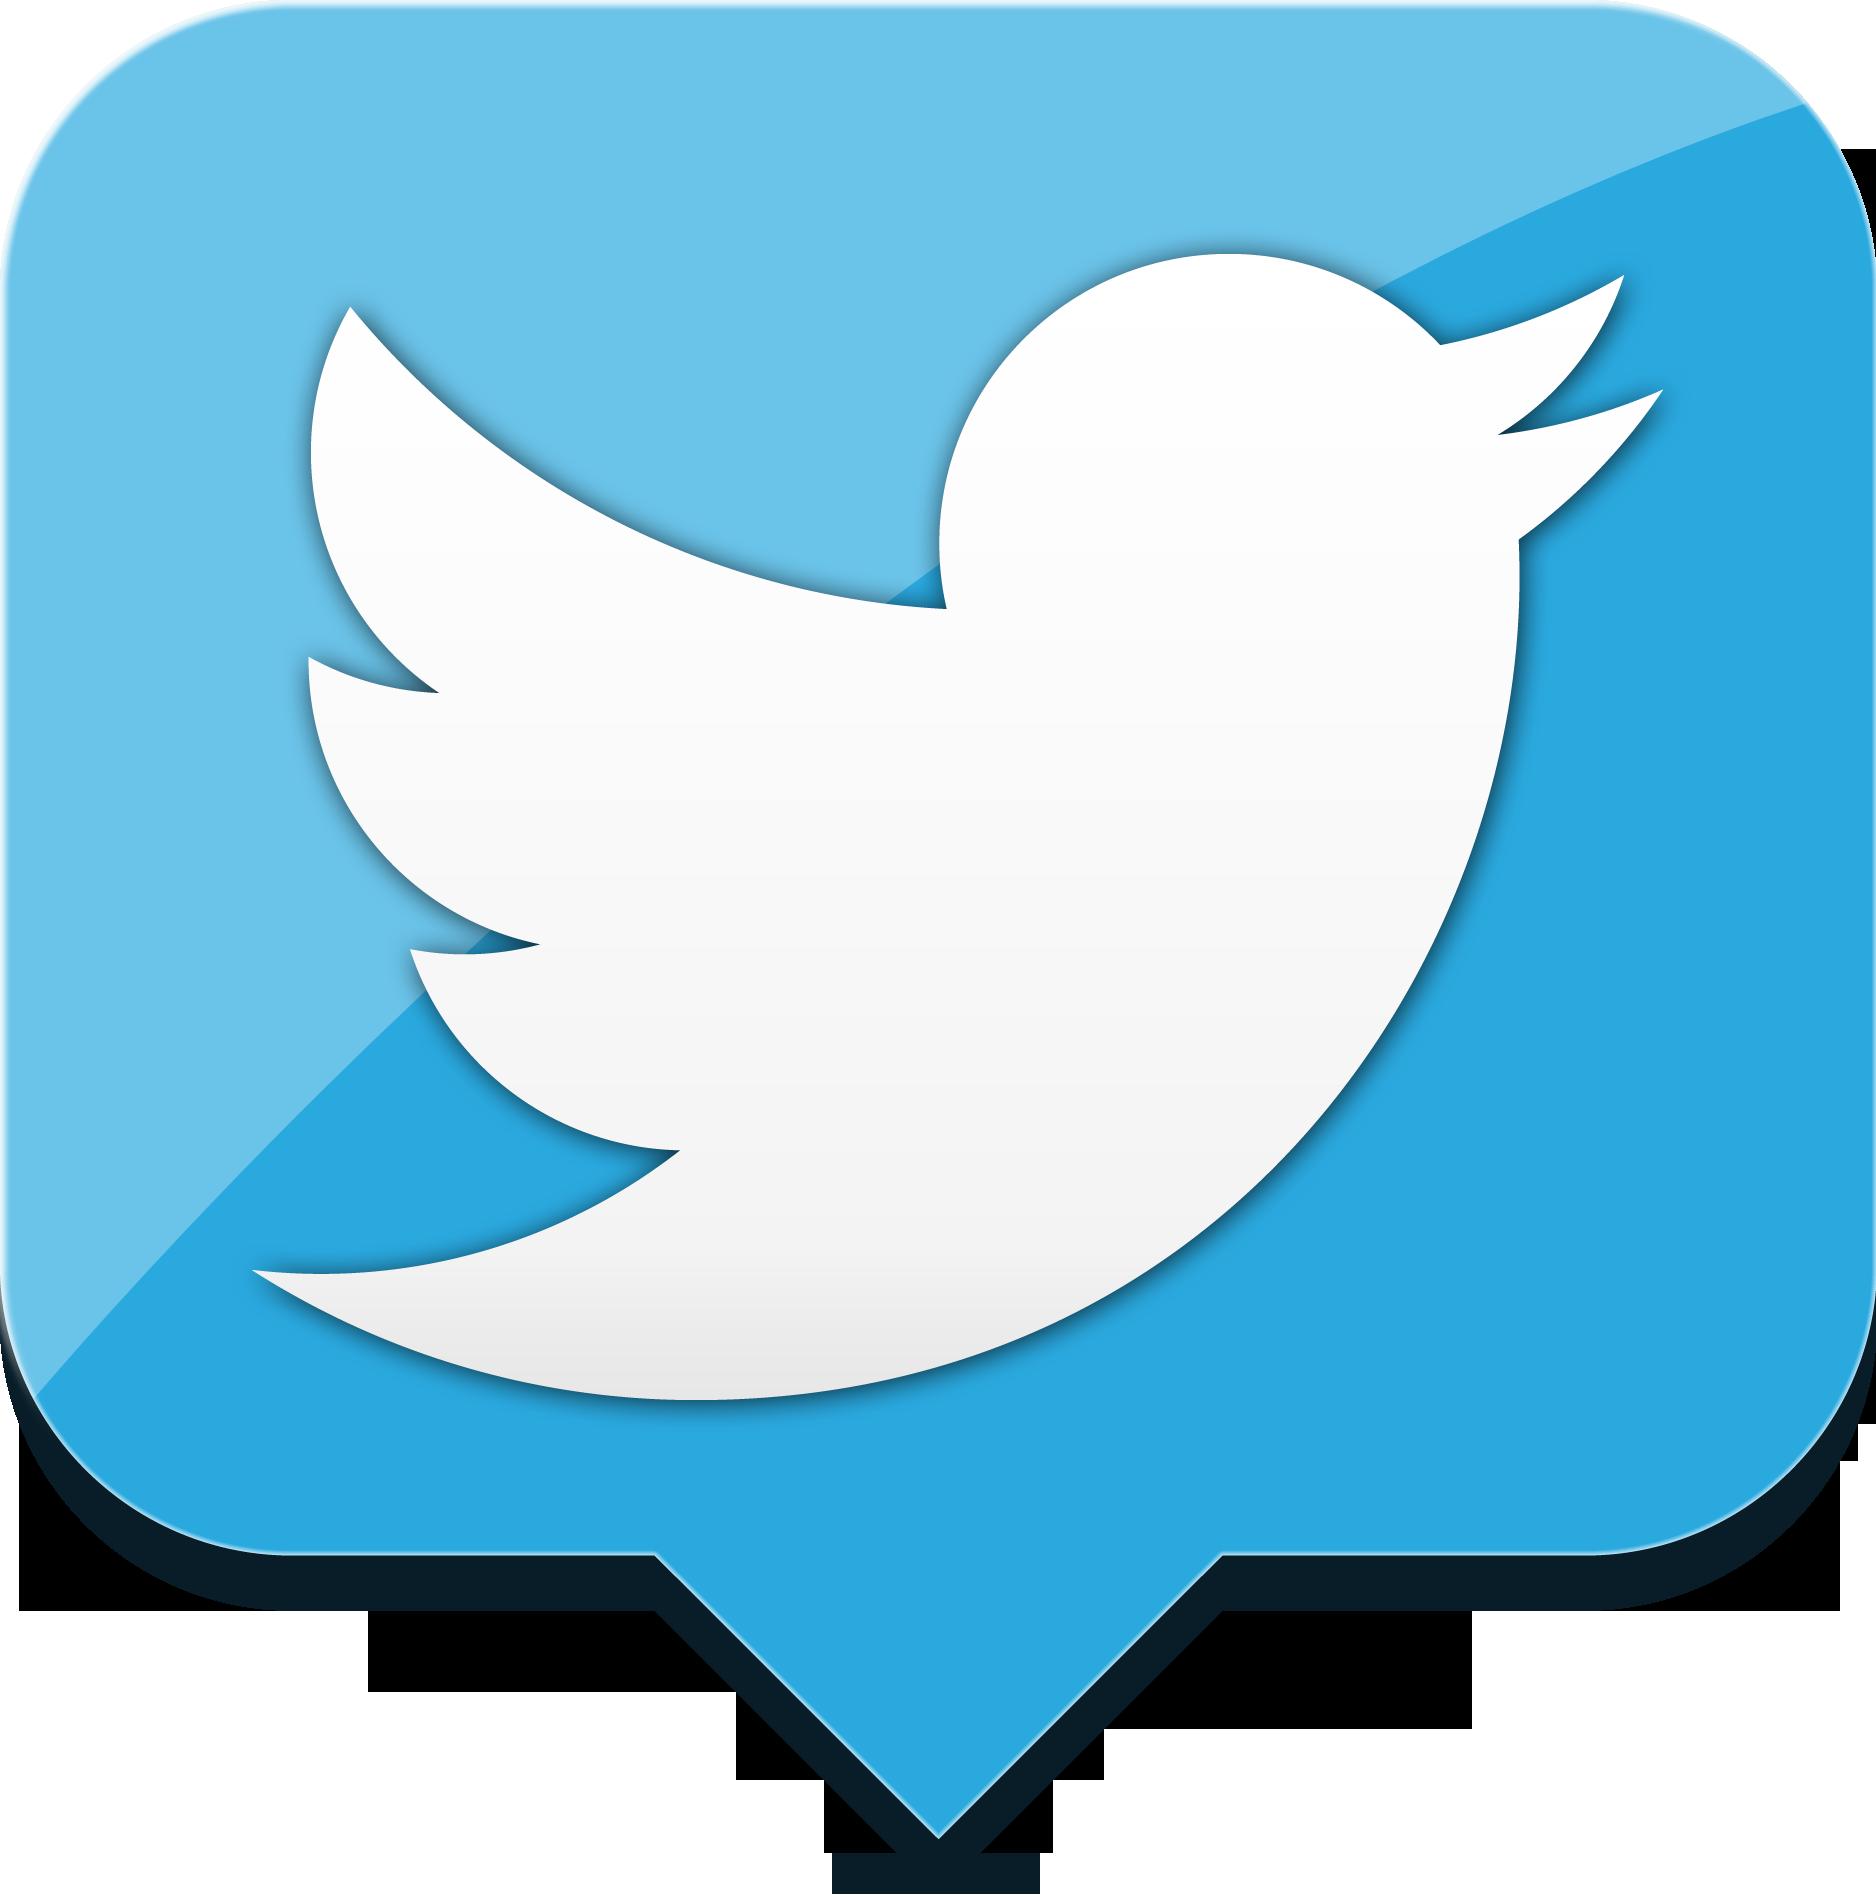 Segui Arcadianet su Twitter